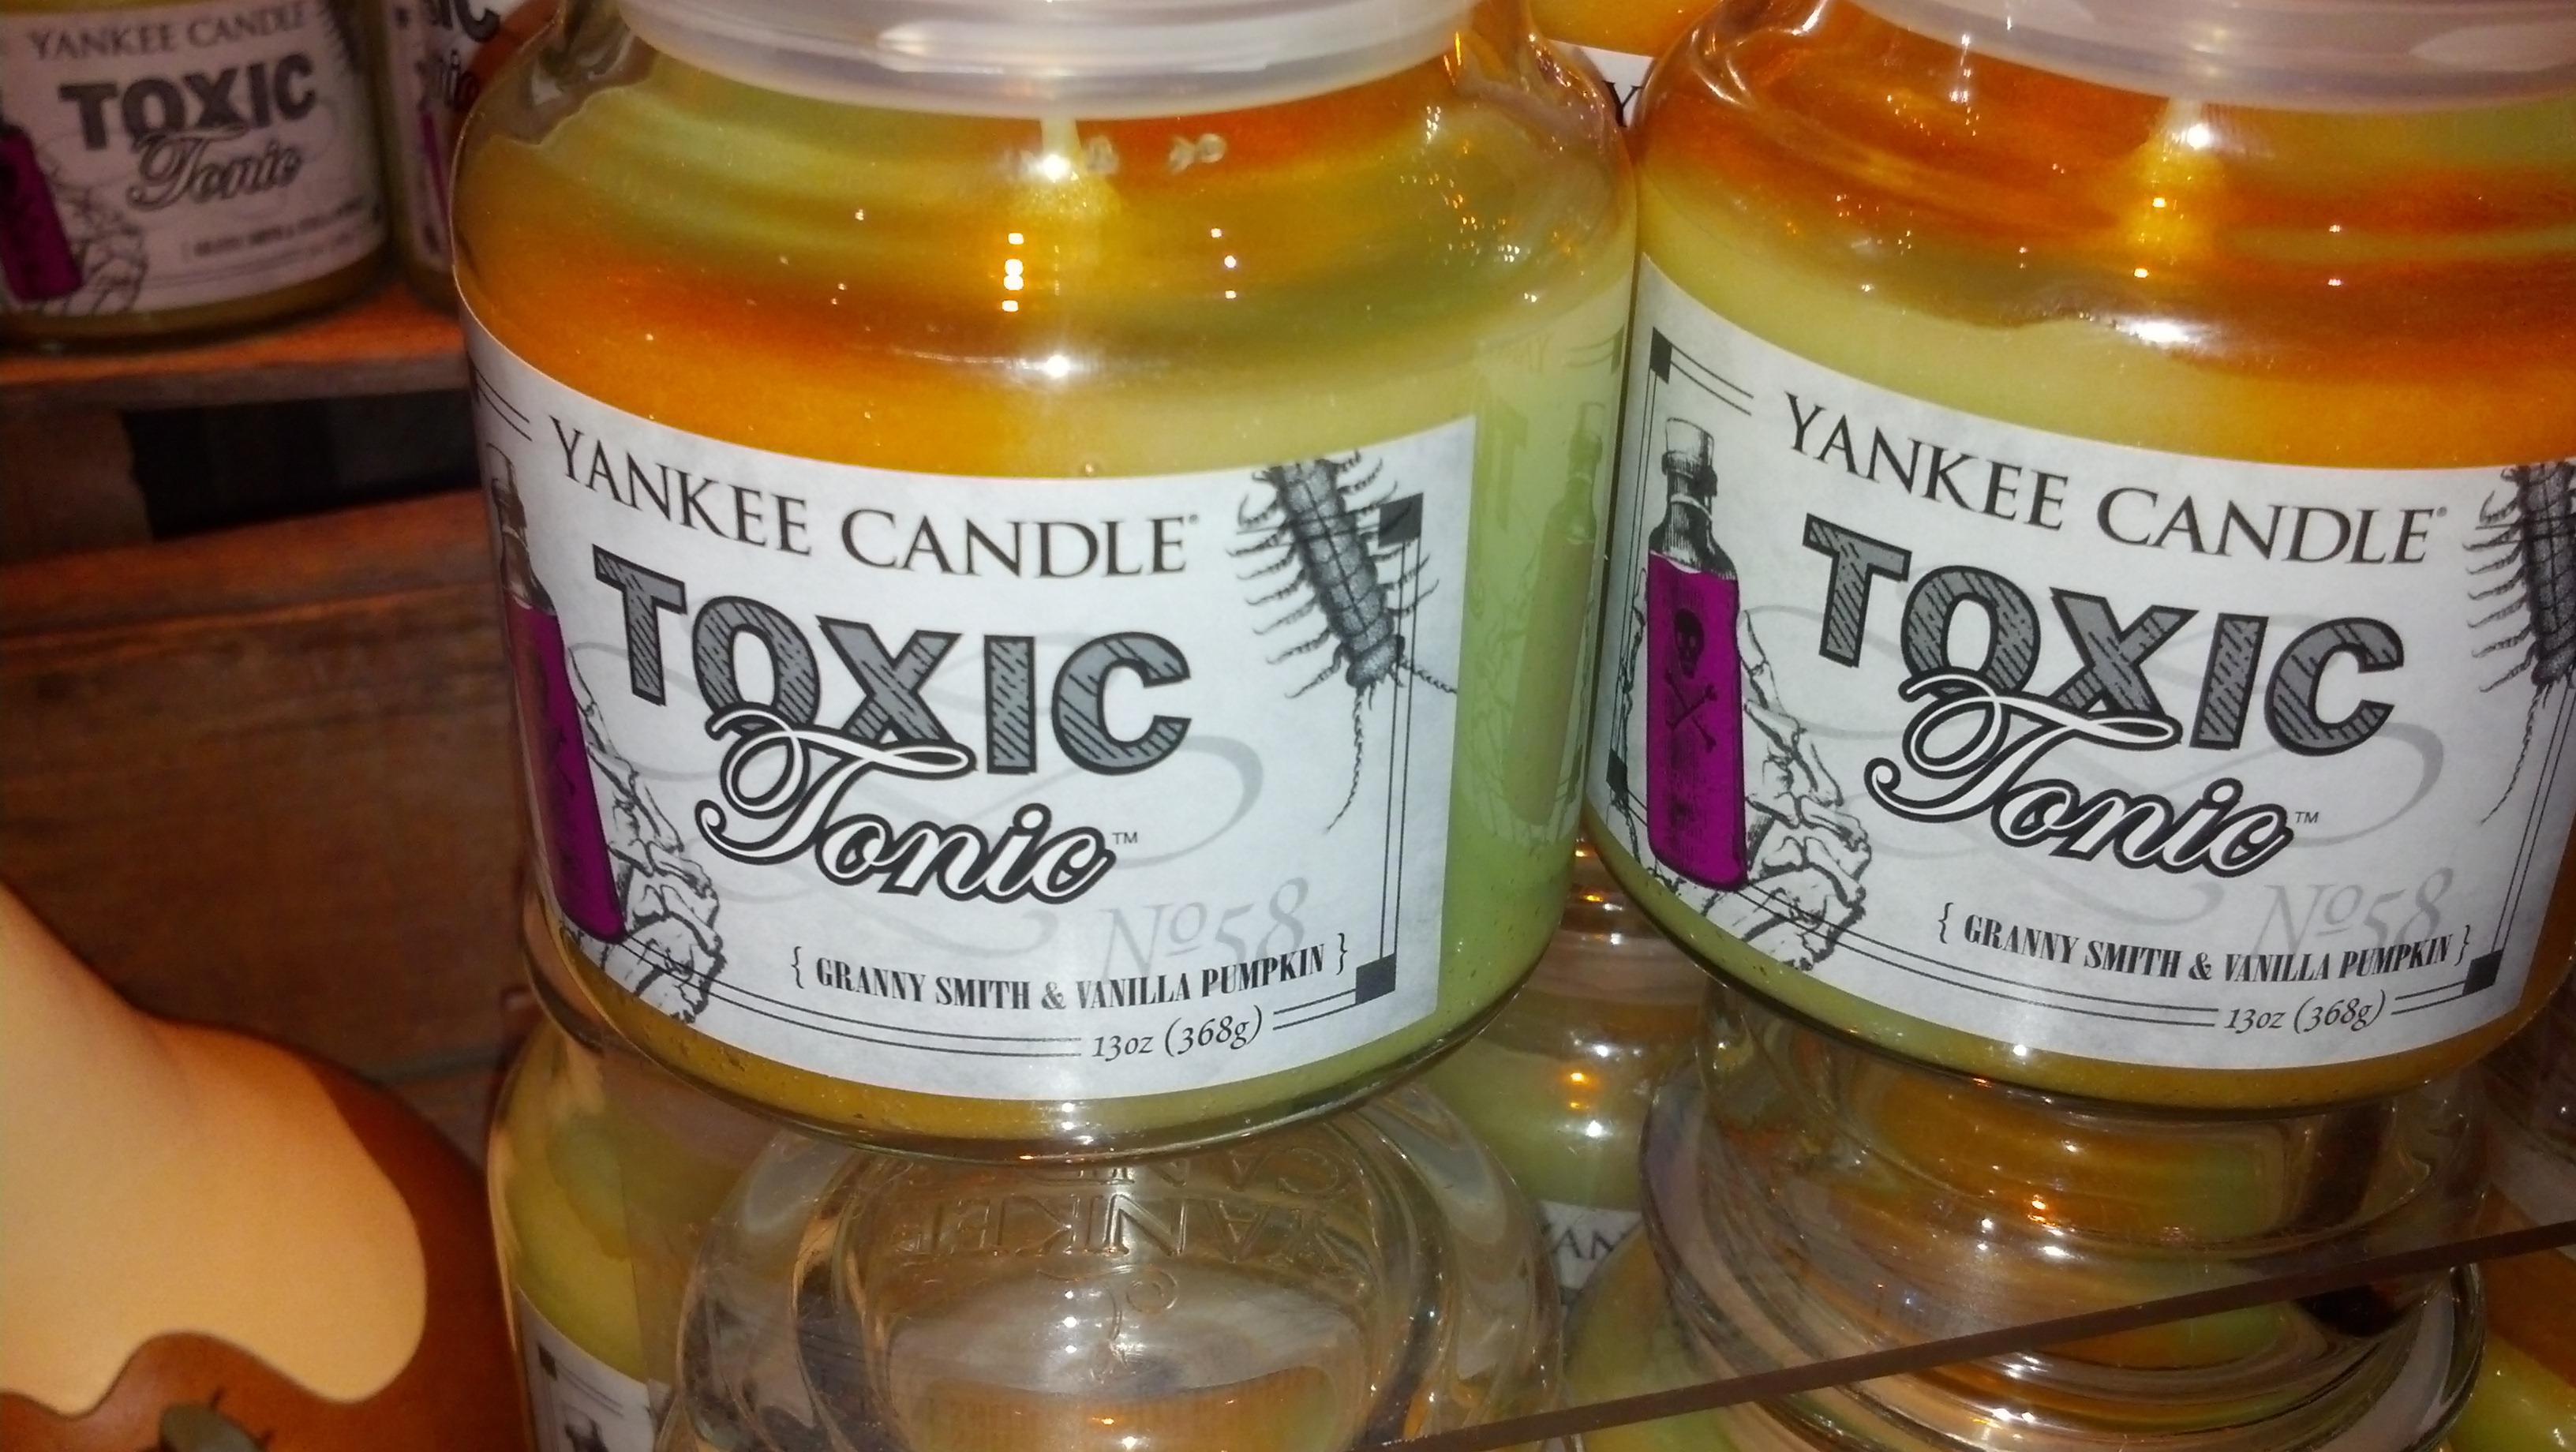 Yankee Candle Village (Part 2) – YankeeCandleSisters